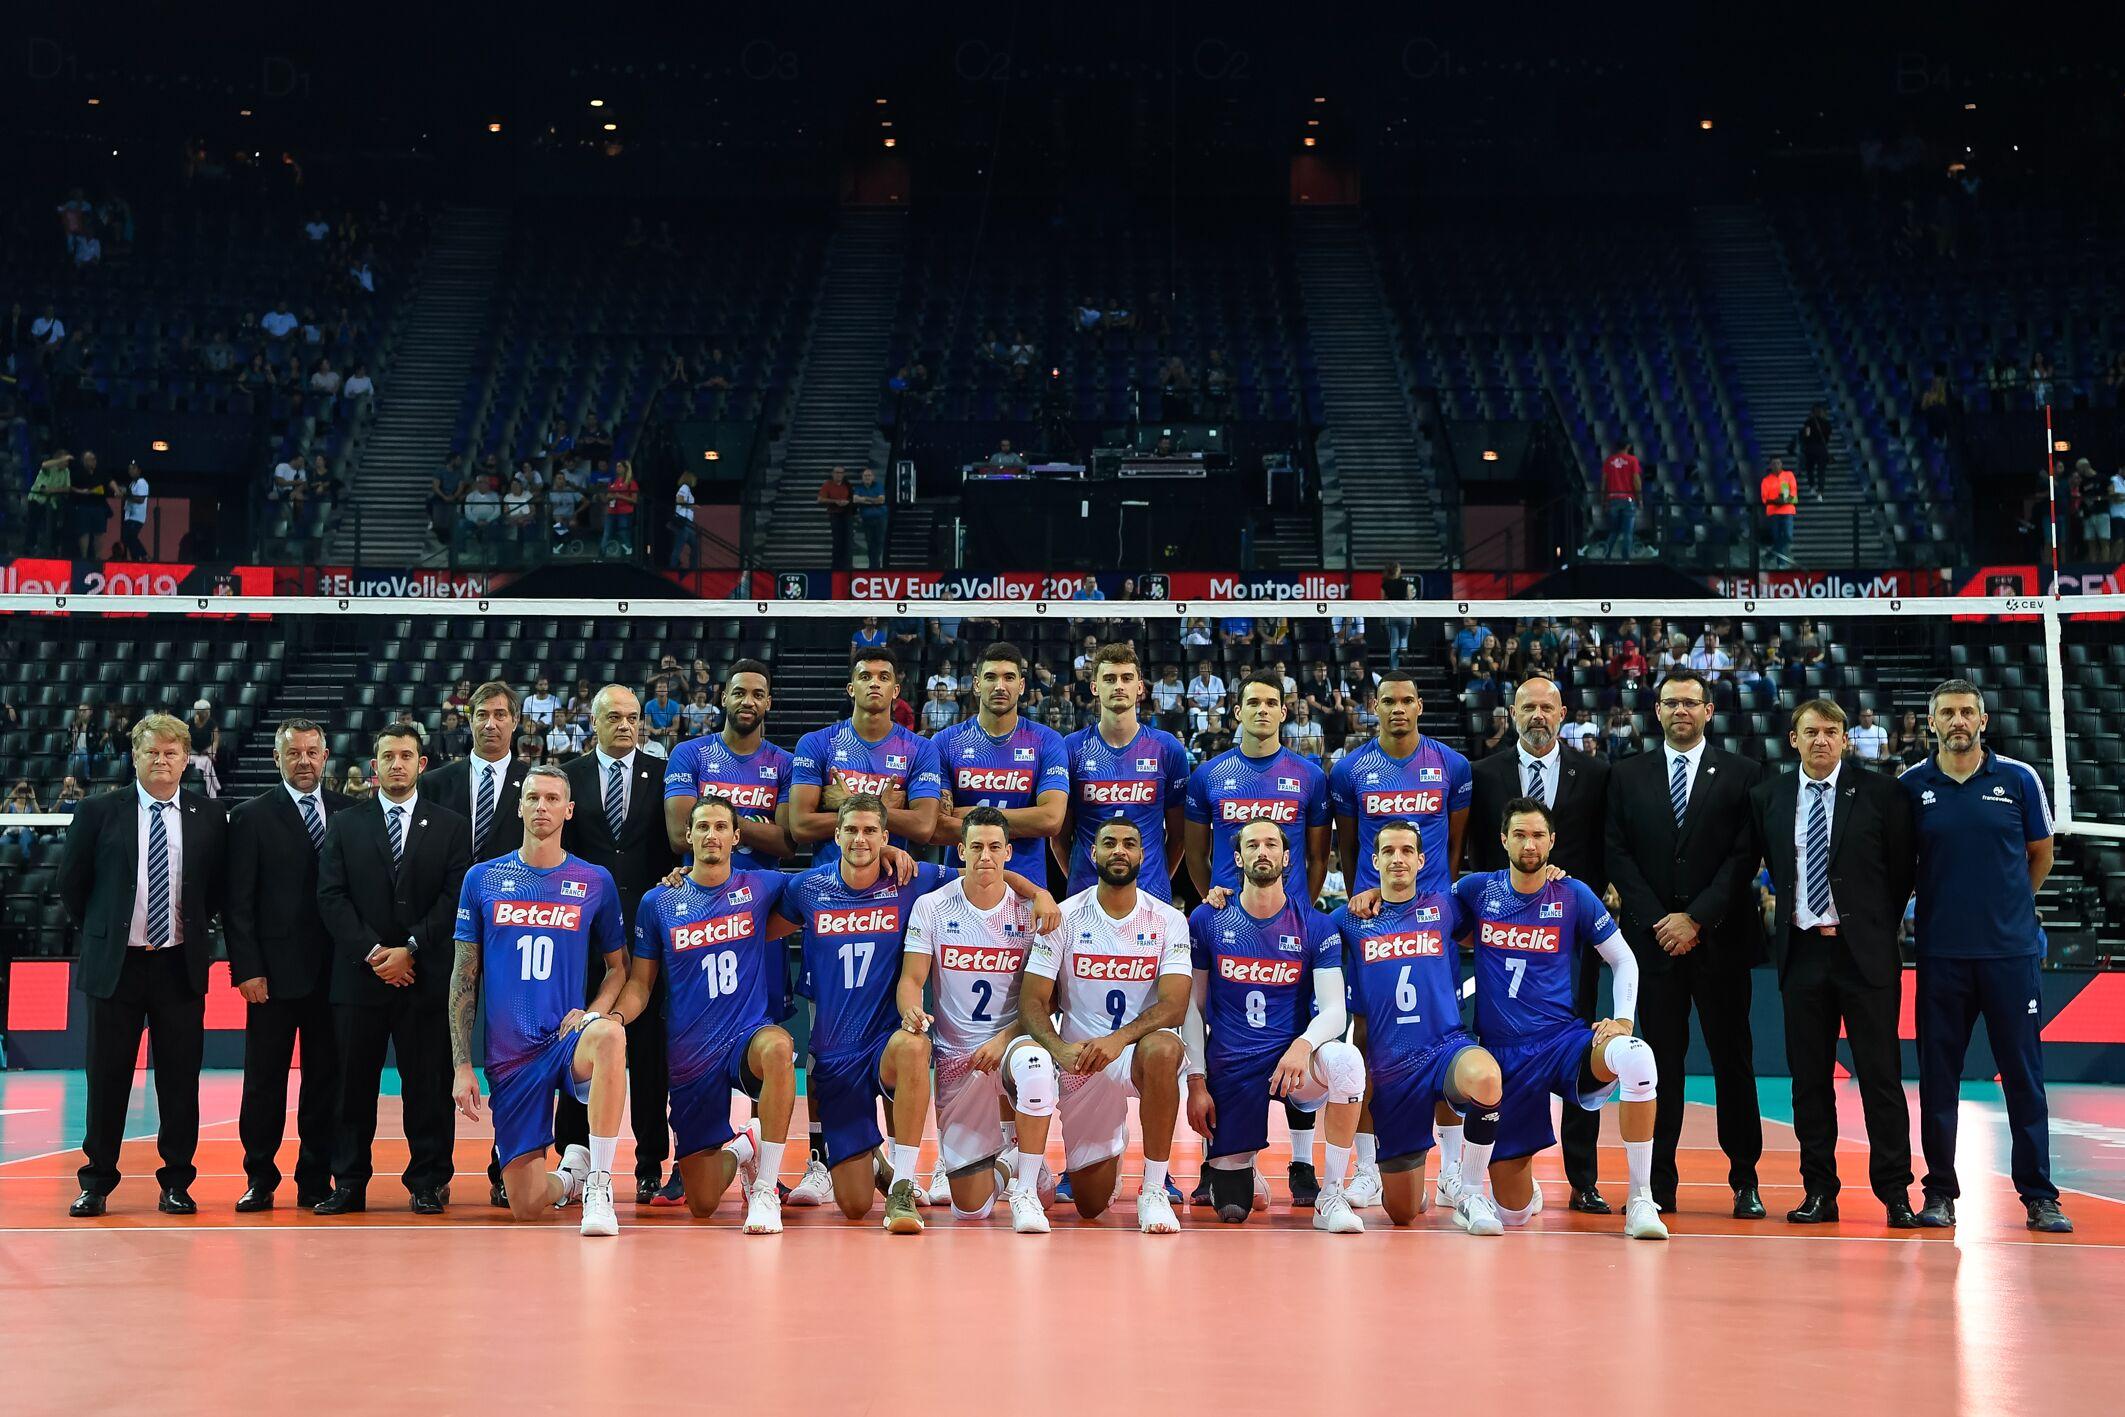 L'équipe de France de Volley.